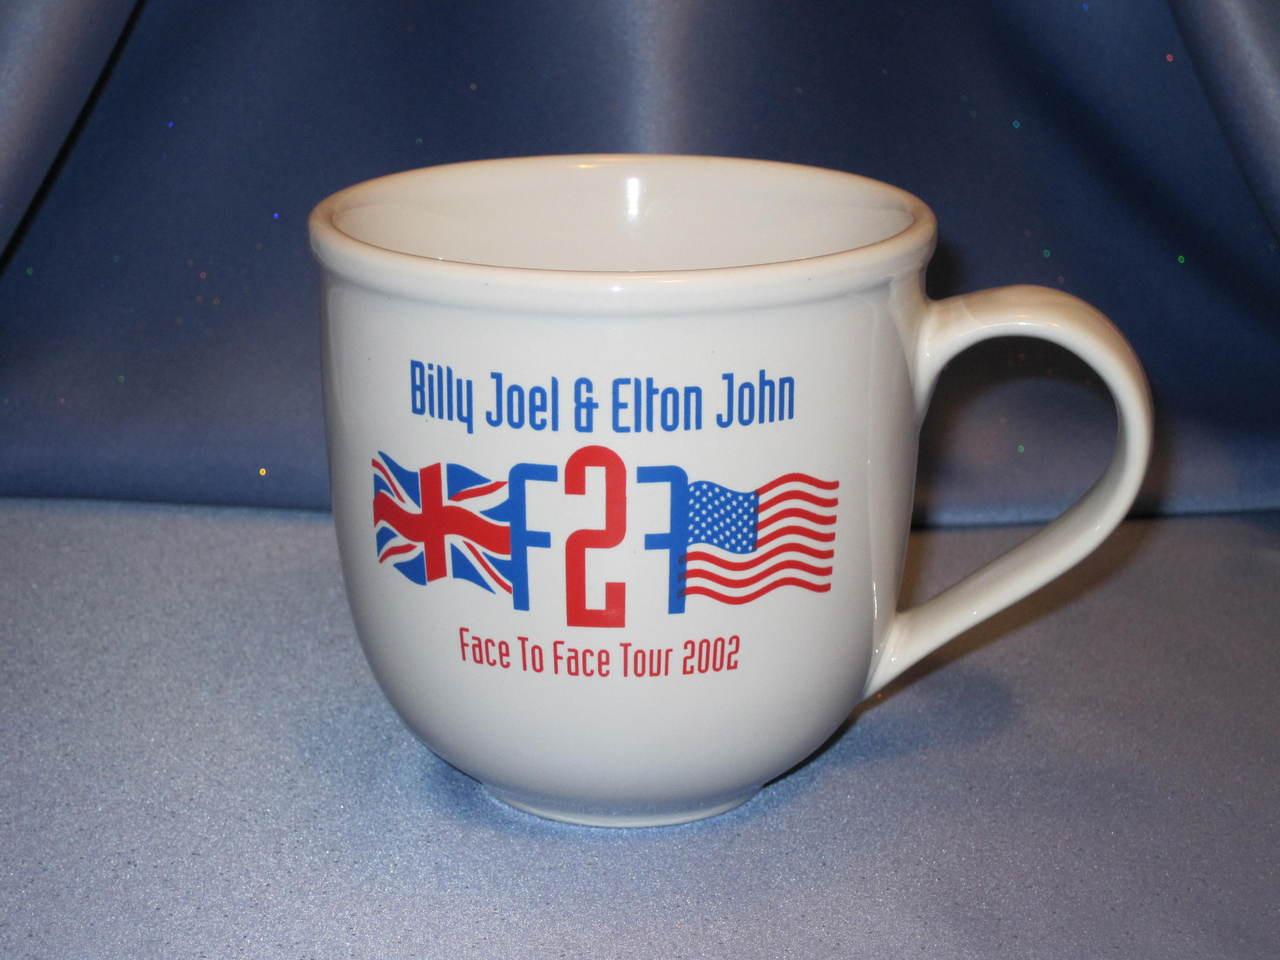 "Billy Joel & Elton John ""Face To Face Concert Tour 2002"